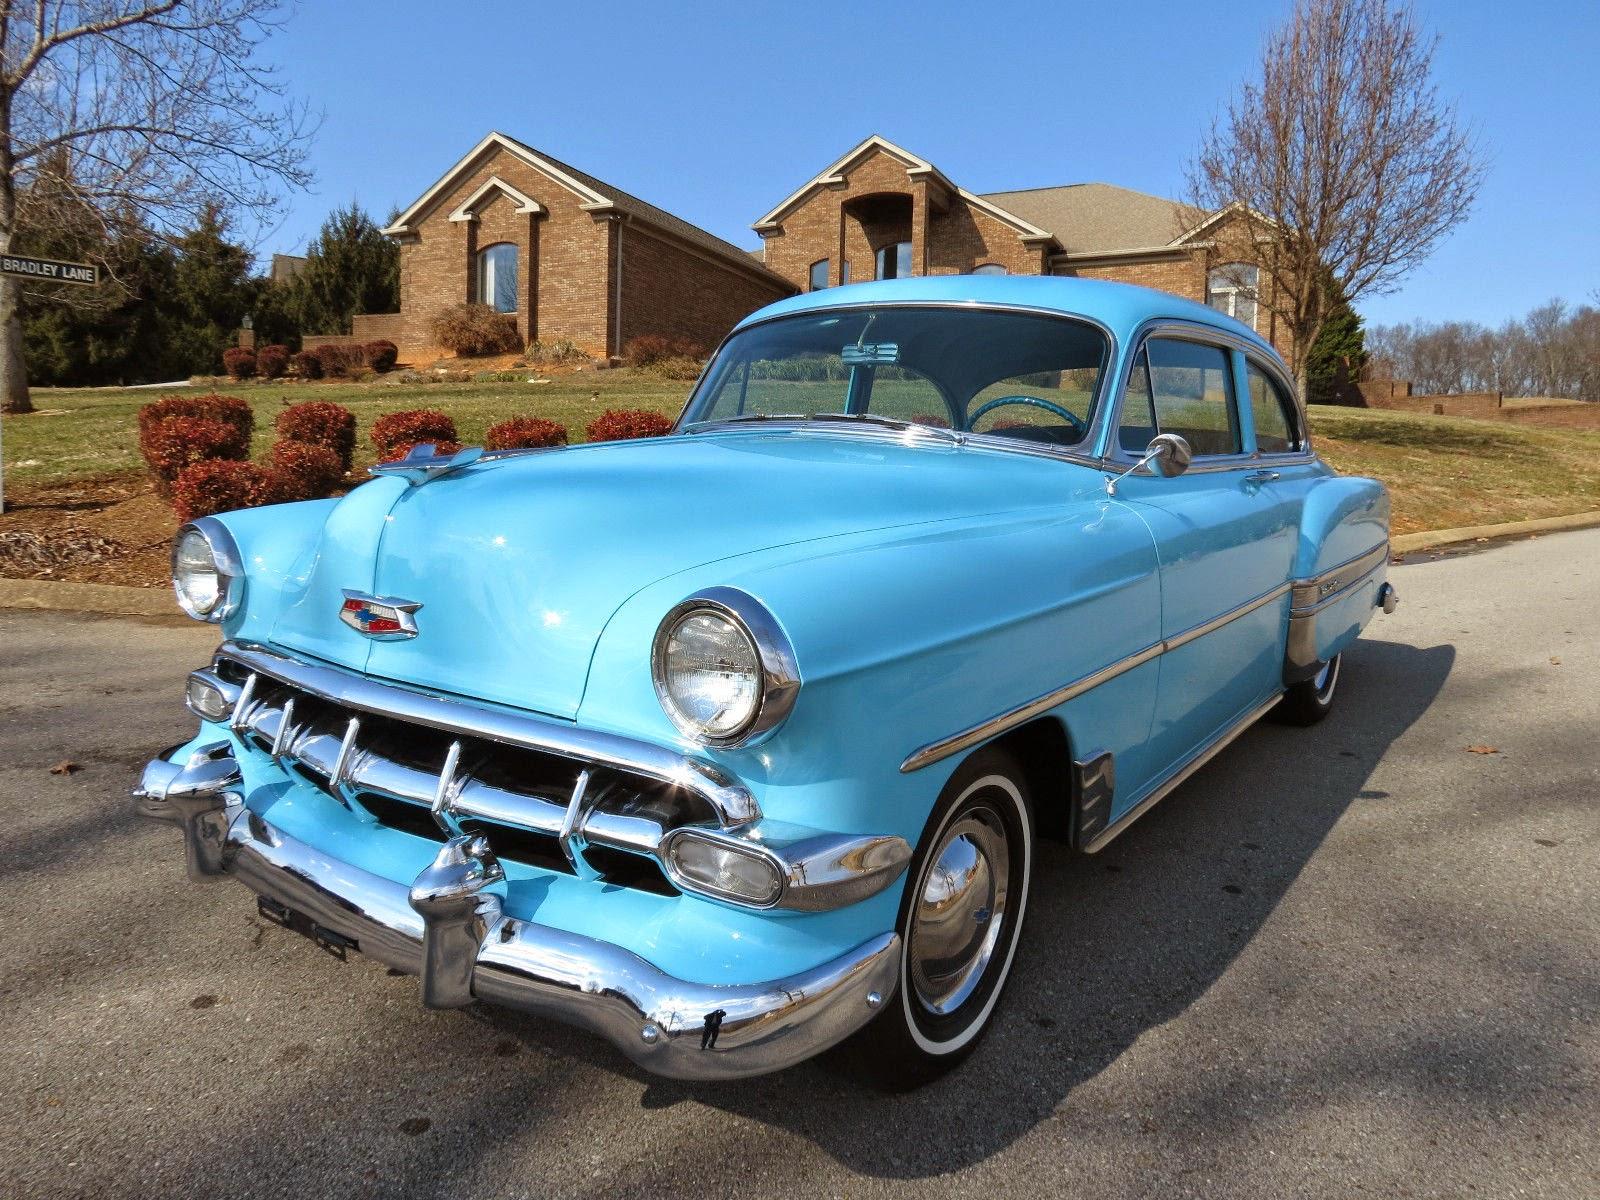 All American Classic Cars 1954 Chevrolet Bel Air 2 Door Sedan